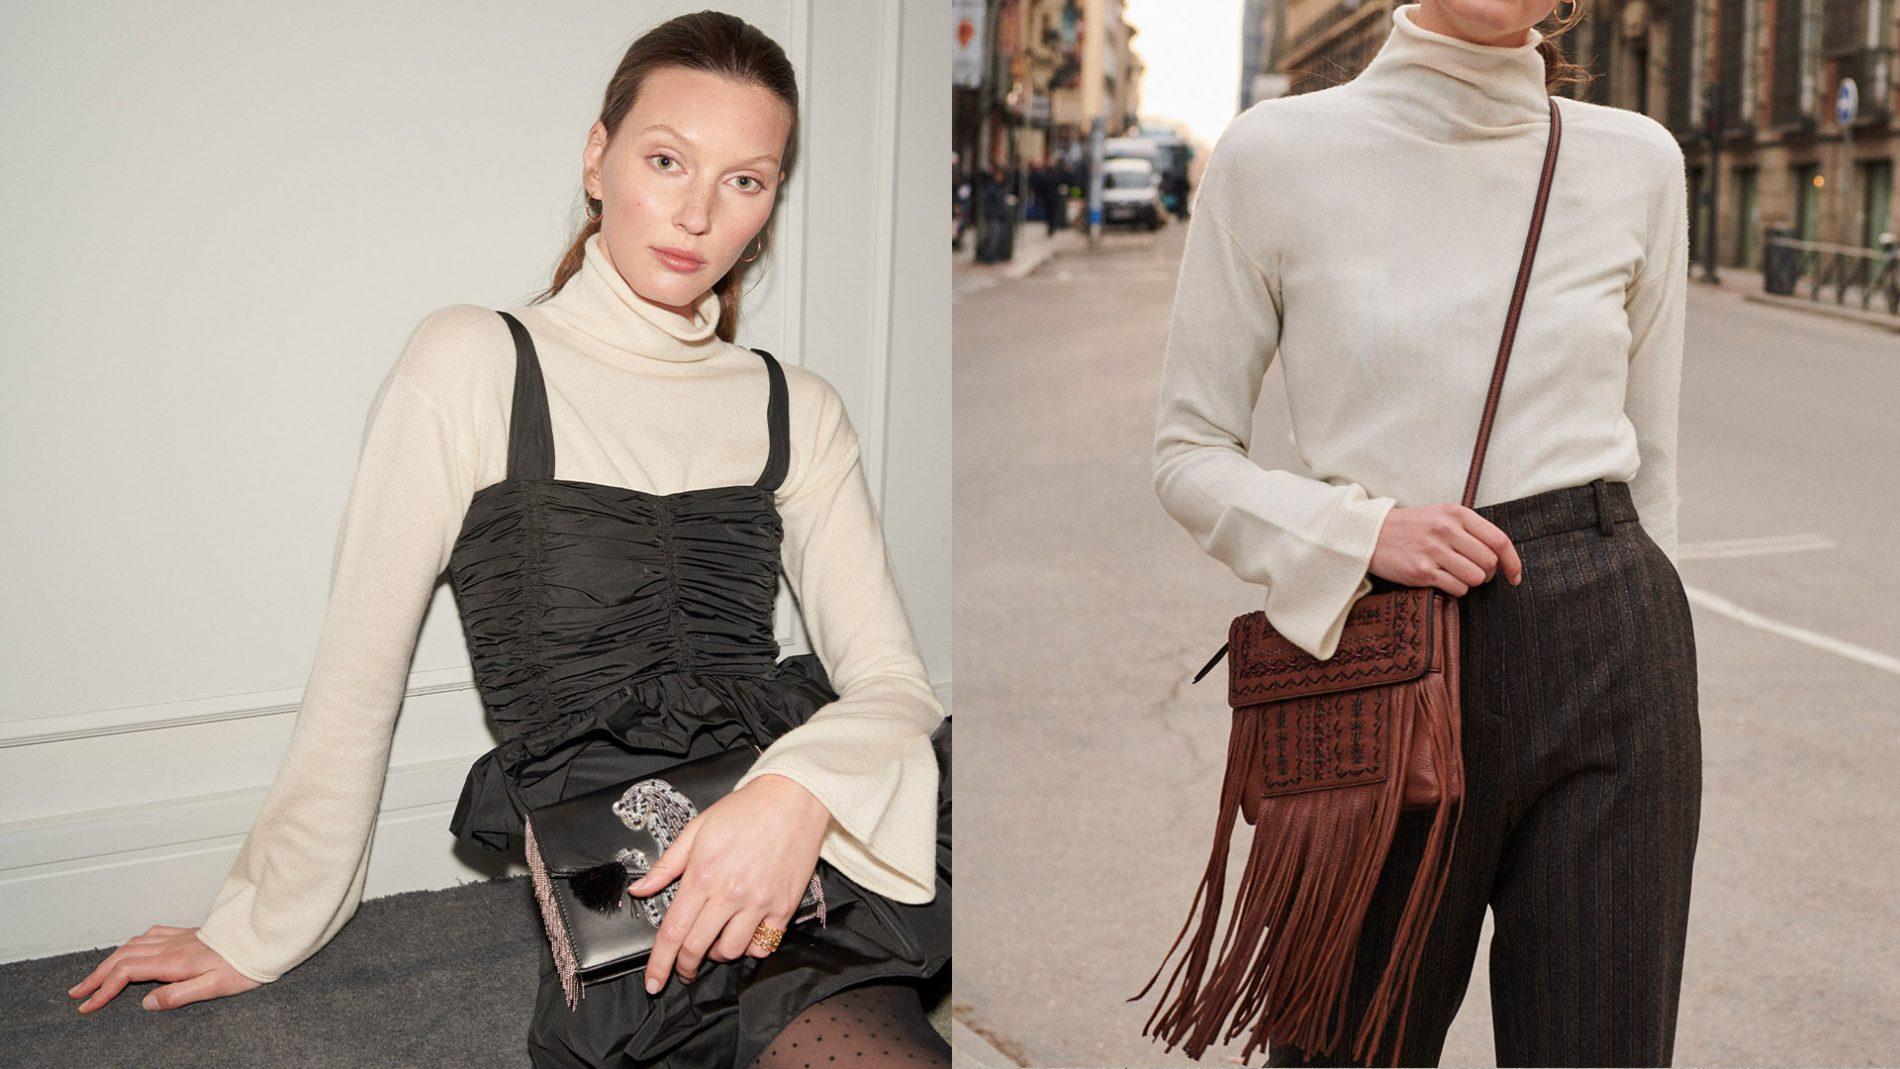 El Corte Inglés Designer Ready-To-Wear Handbags See By Chloe Theory Les Petits Joueurs